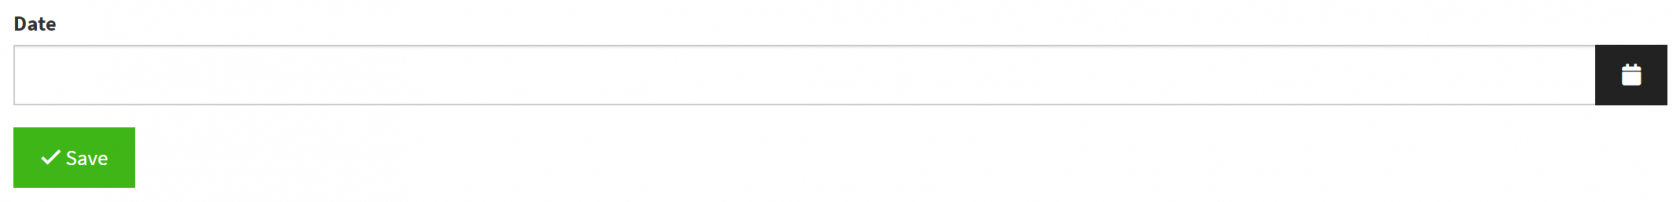 default-form-value-no-date.png